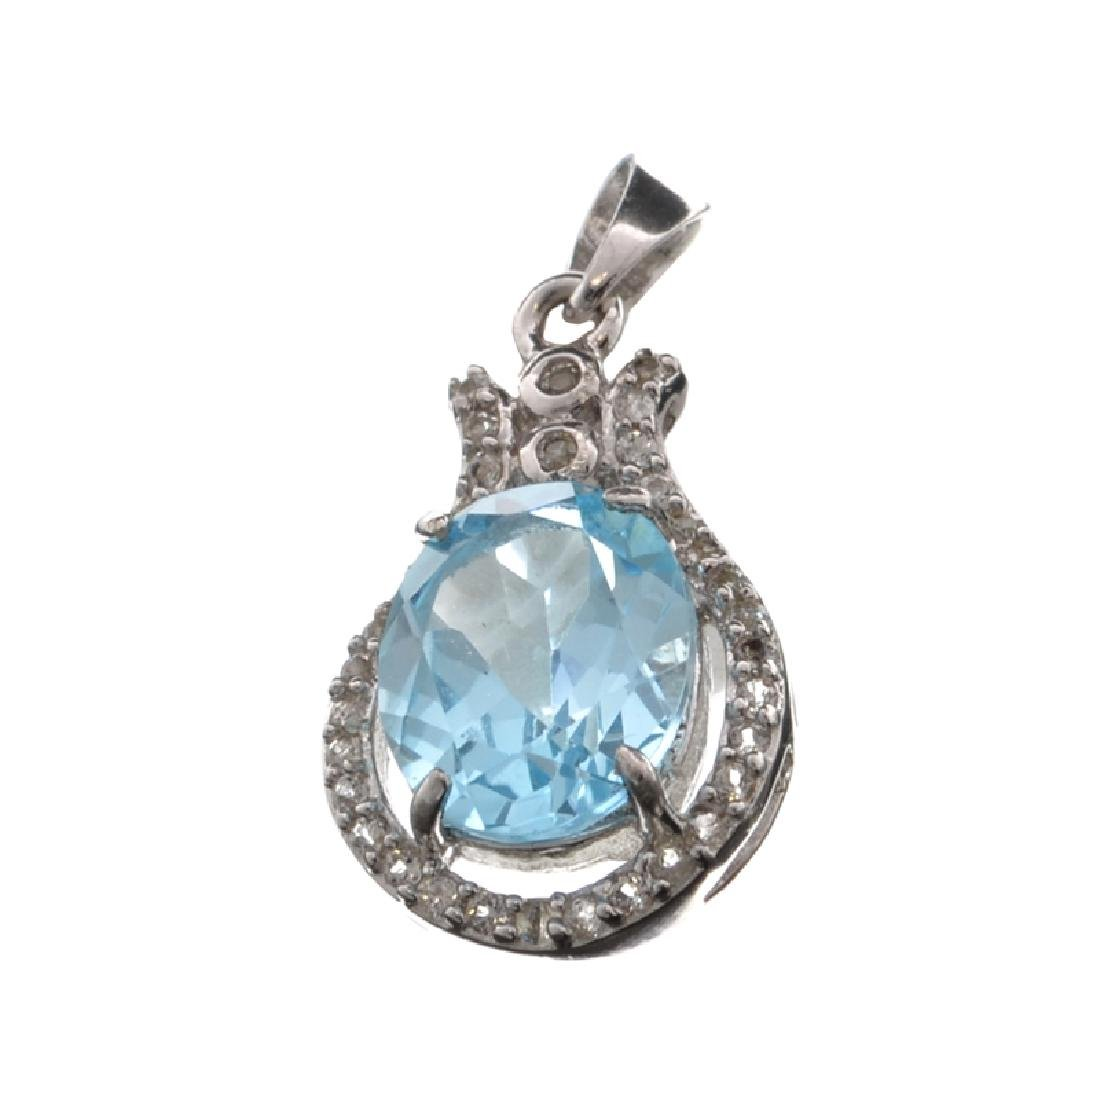 APP: 0.8k Fine Jewelry 4.60CT Blue Topaz And White